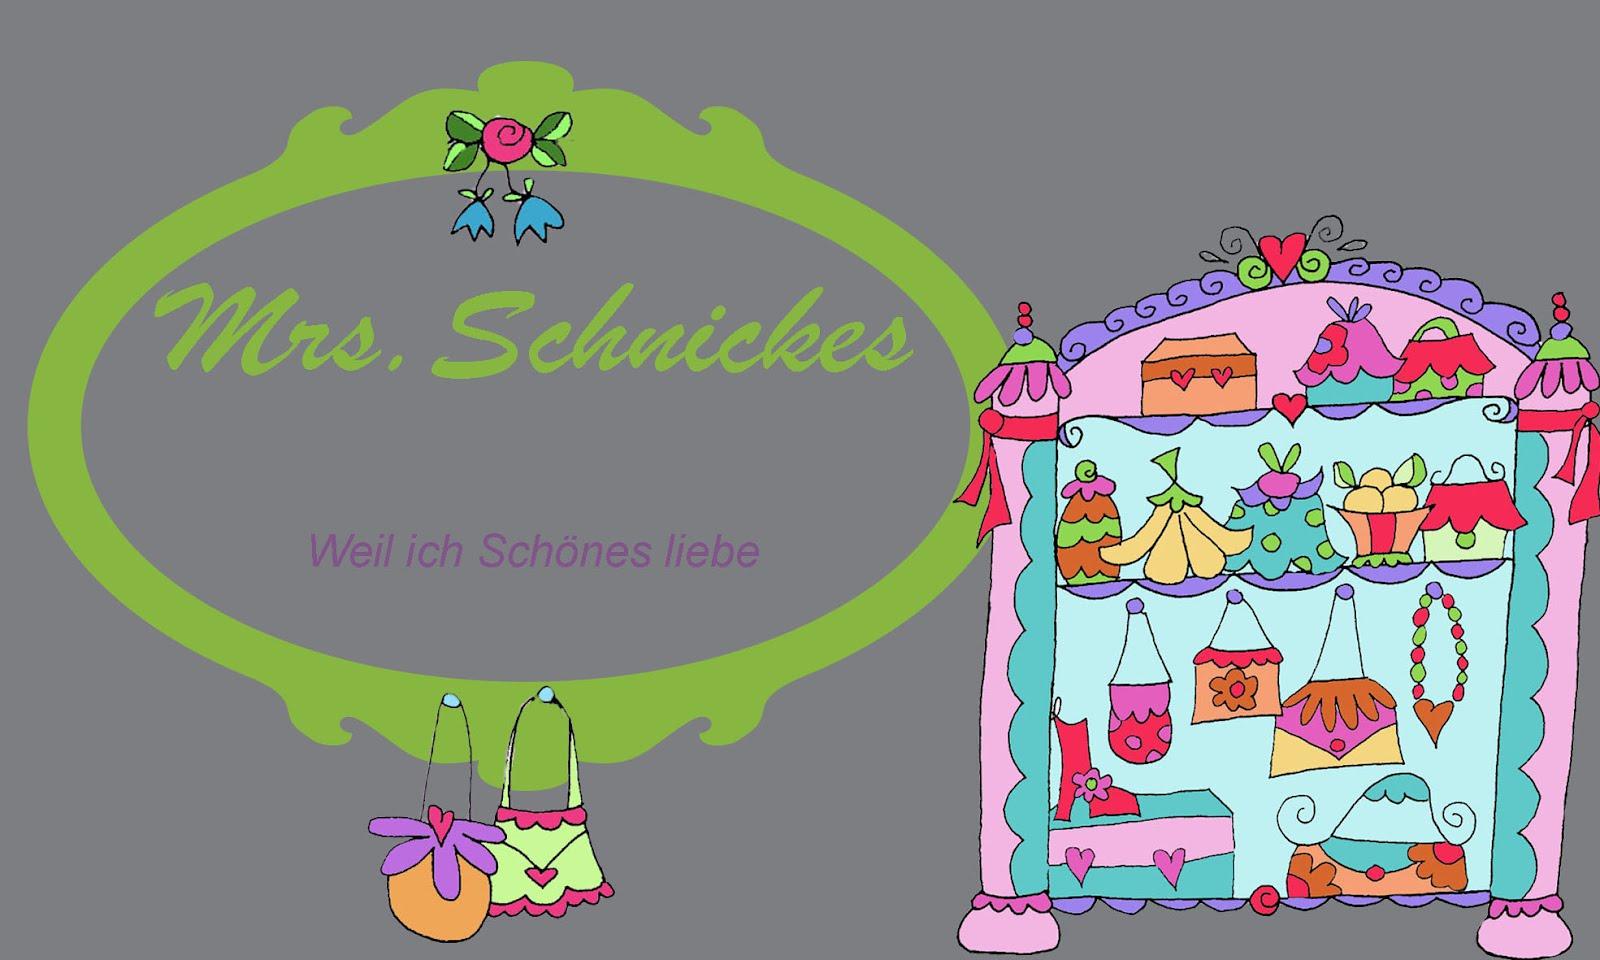 Mrs. Schnickes